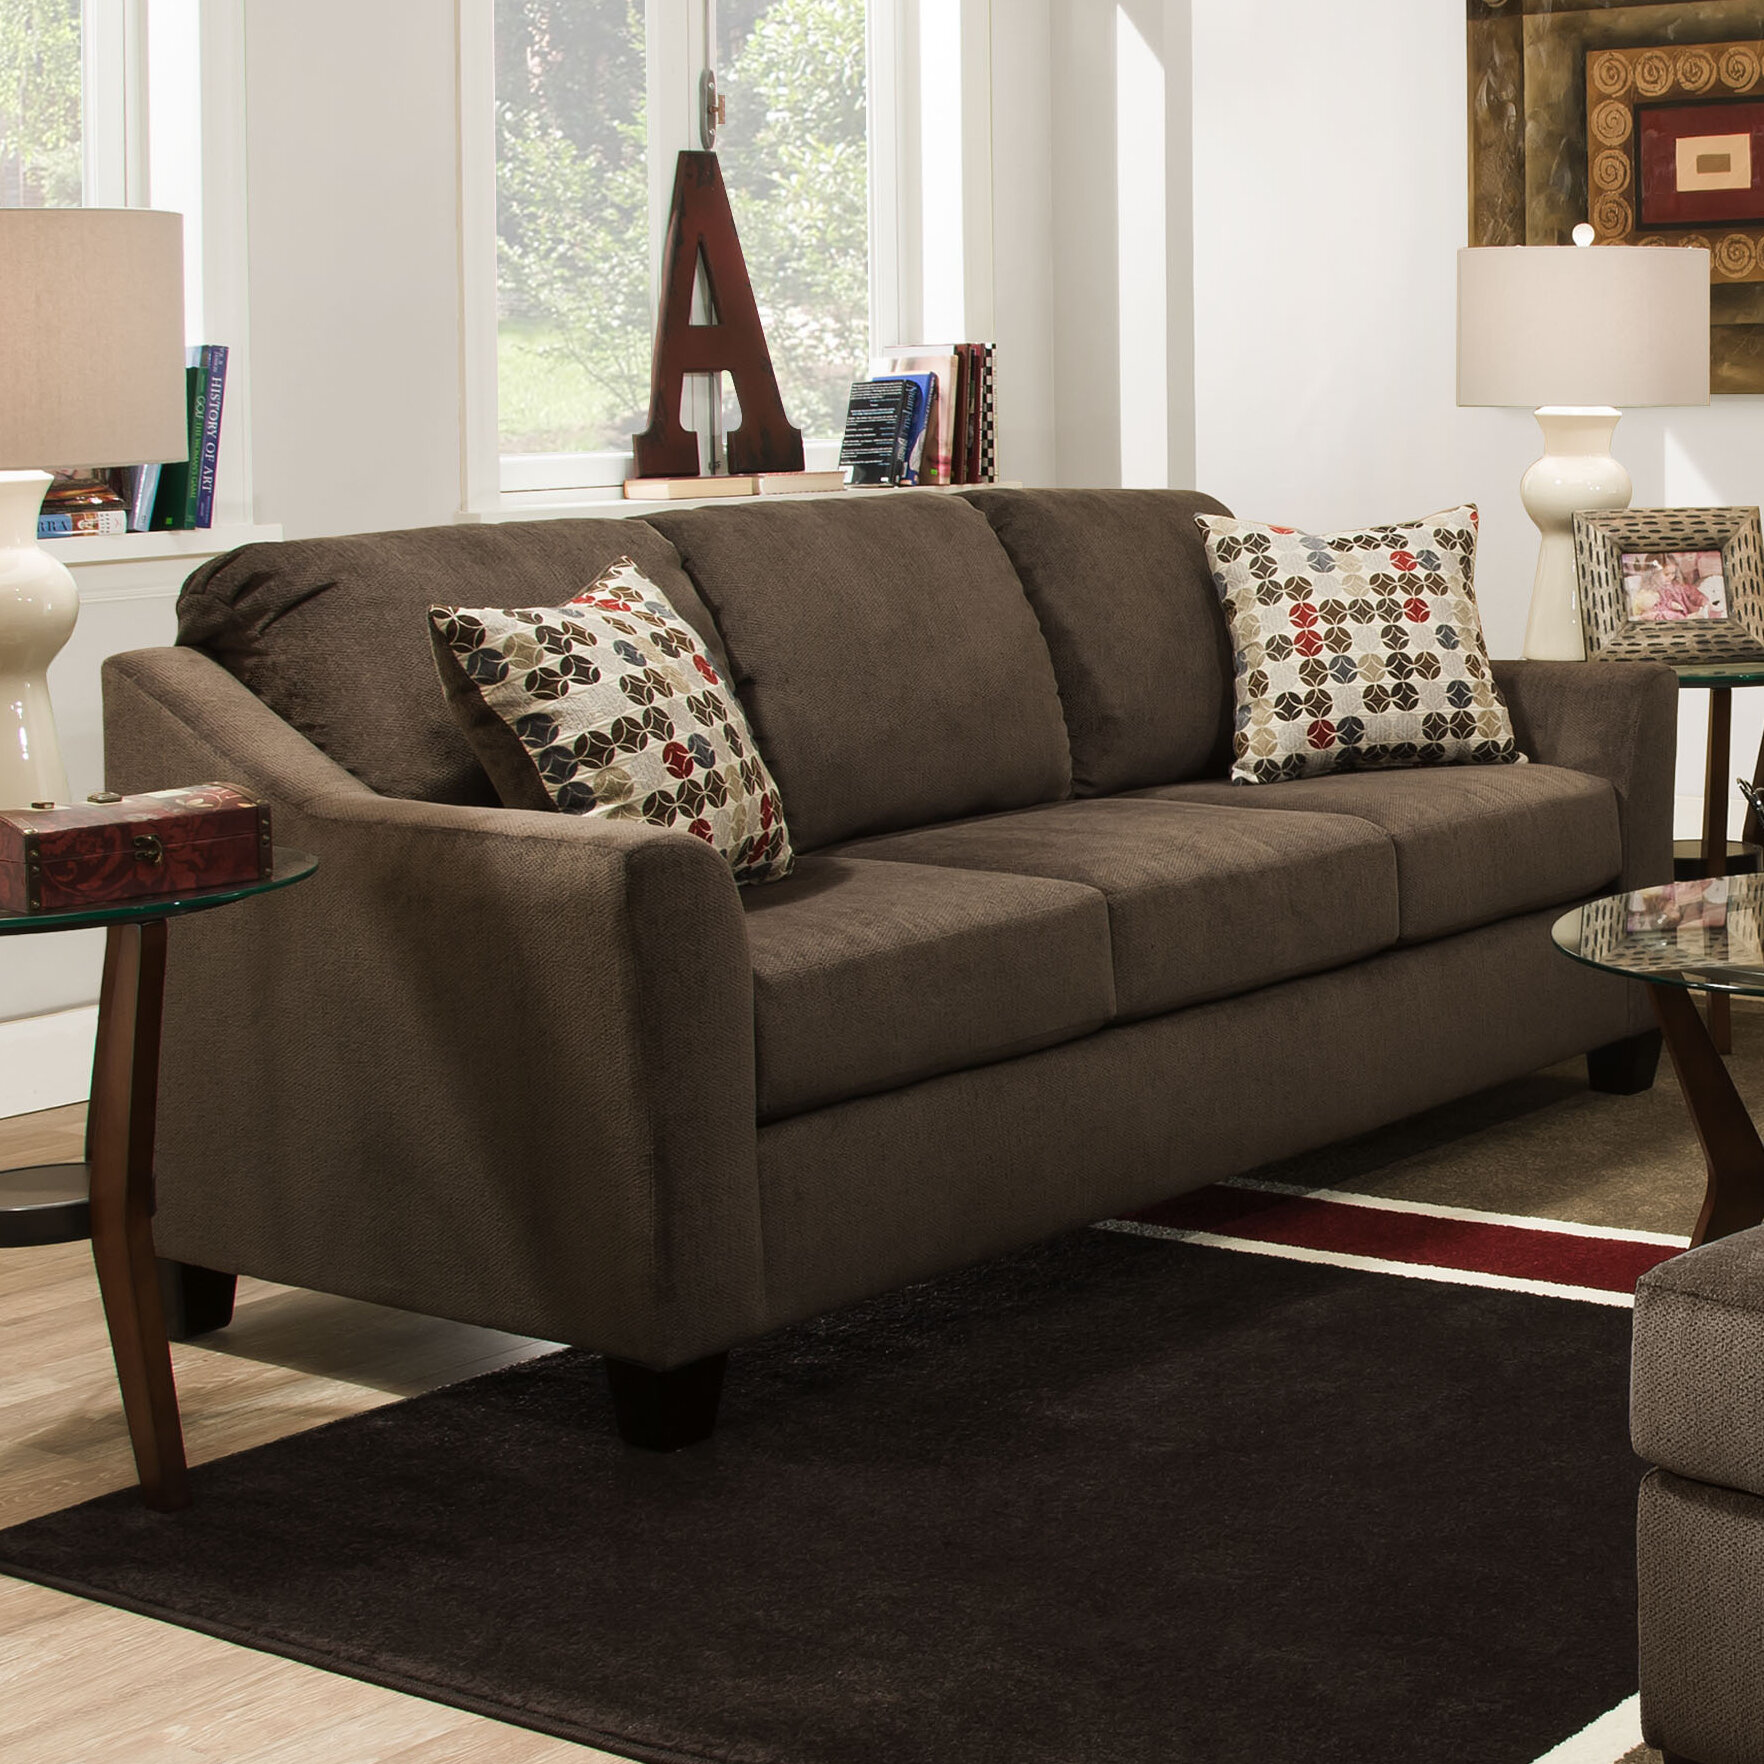 darby home co simmons upholstery olivia sleeper sofa reviews wayfair rh wayfair com simmons sleeper sofa mattress replacement simmons sectional sleeper sofa